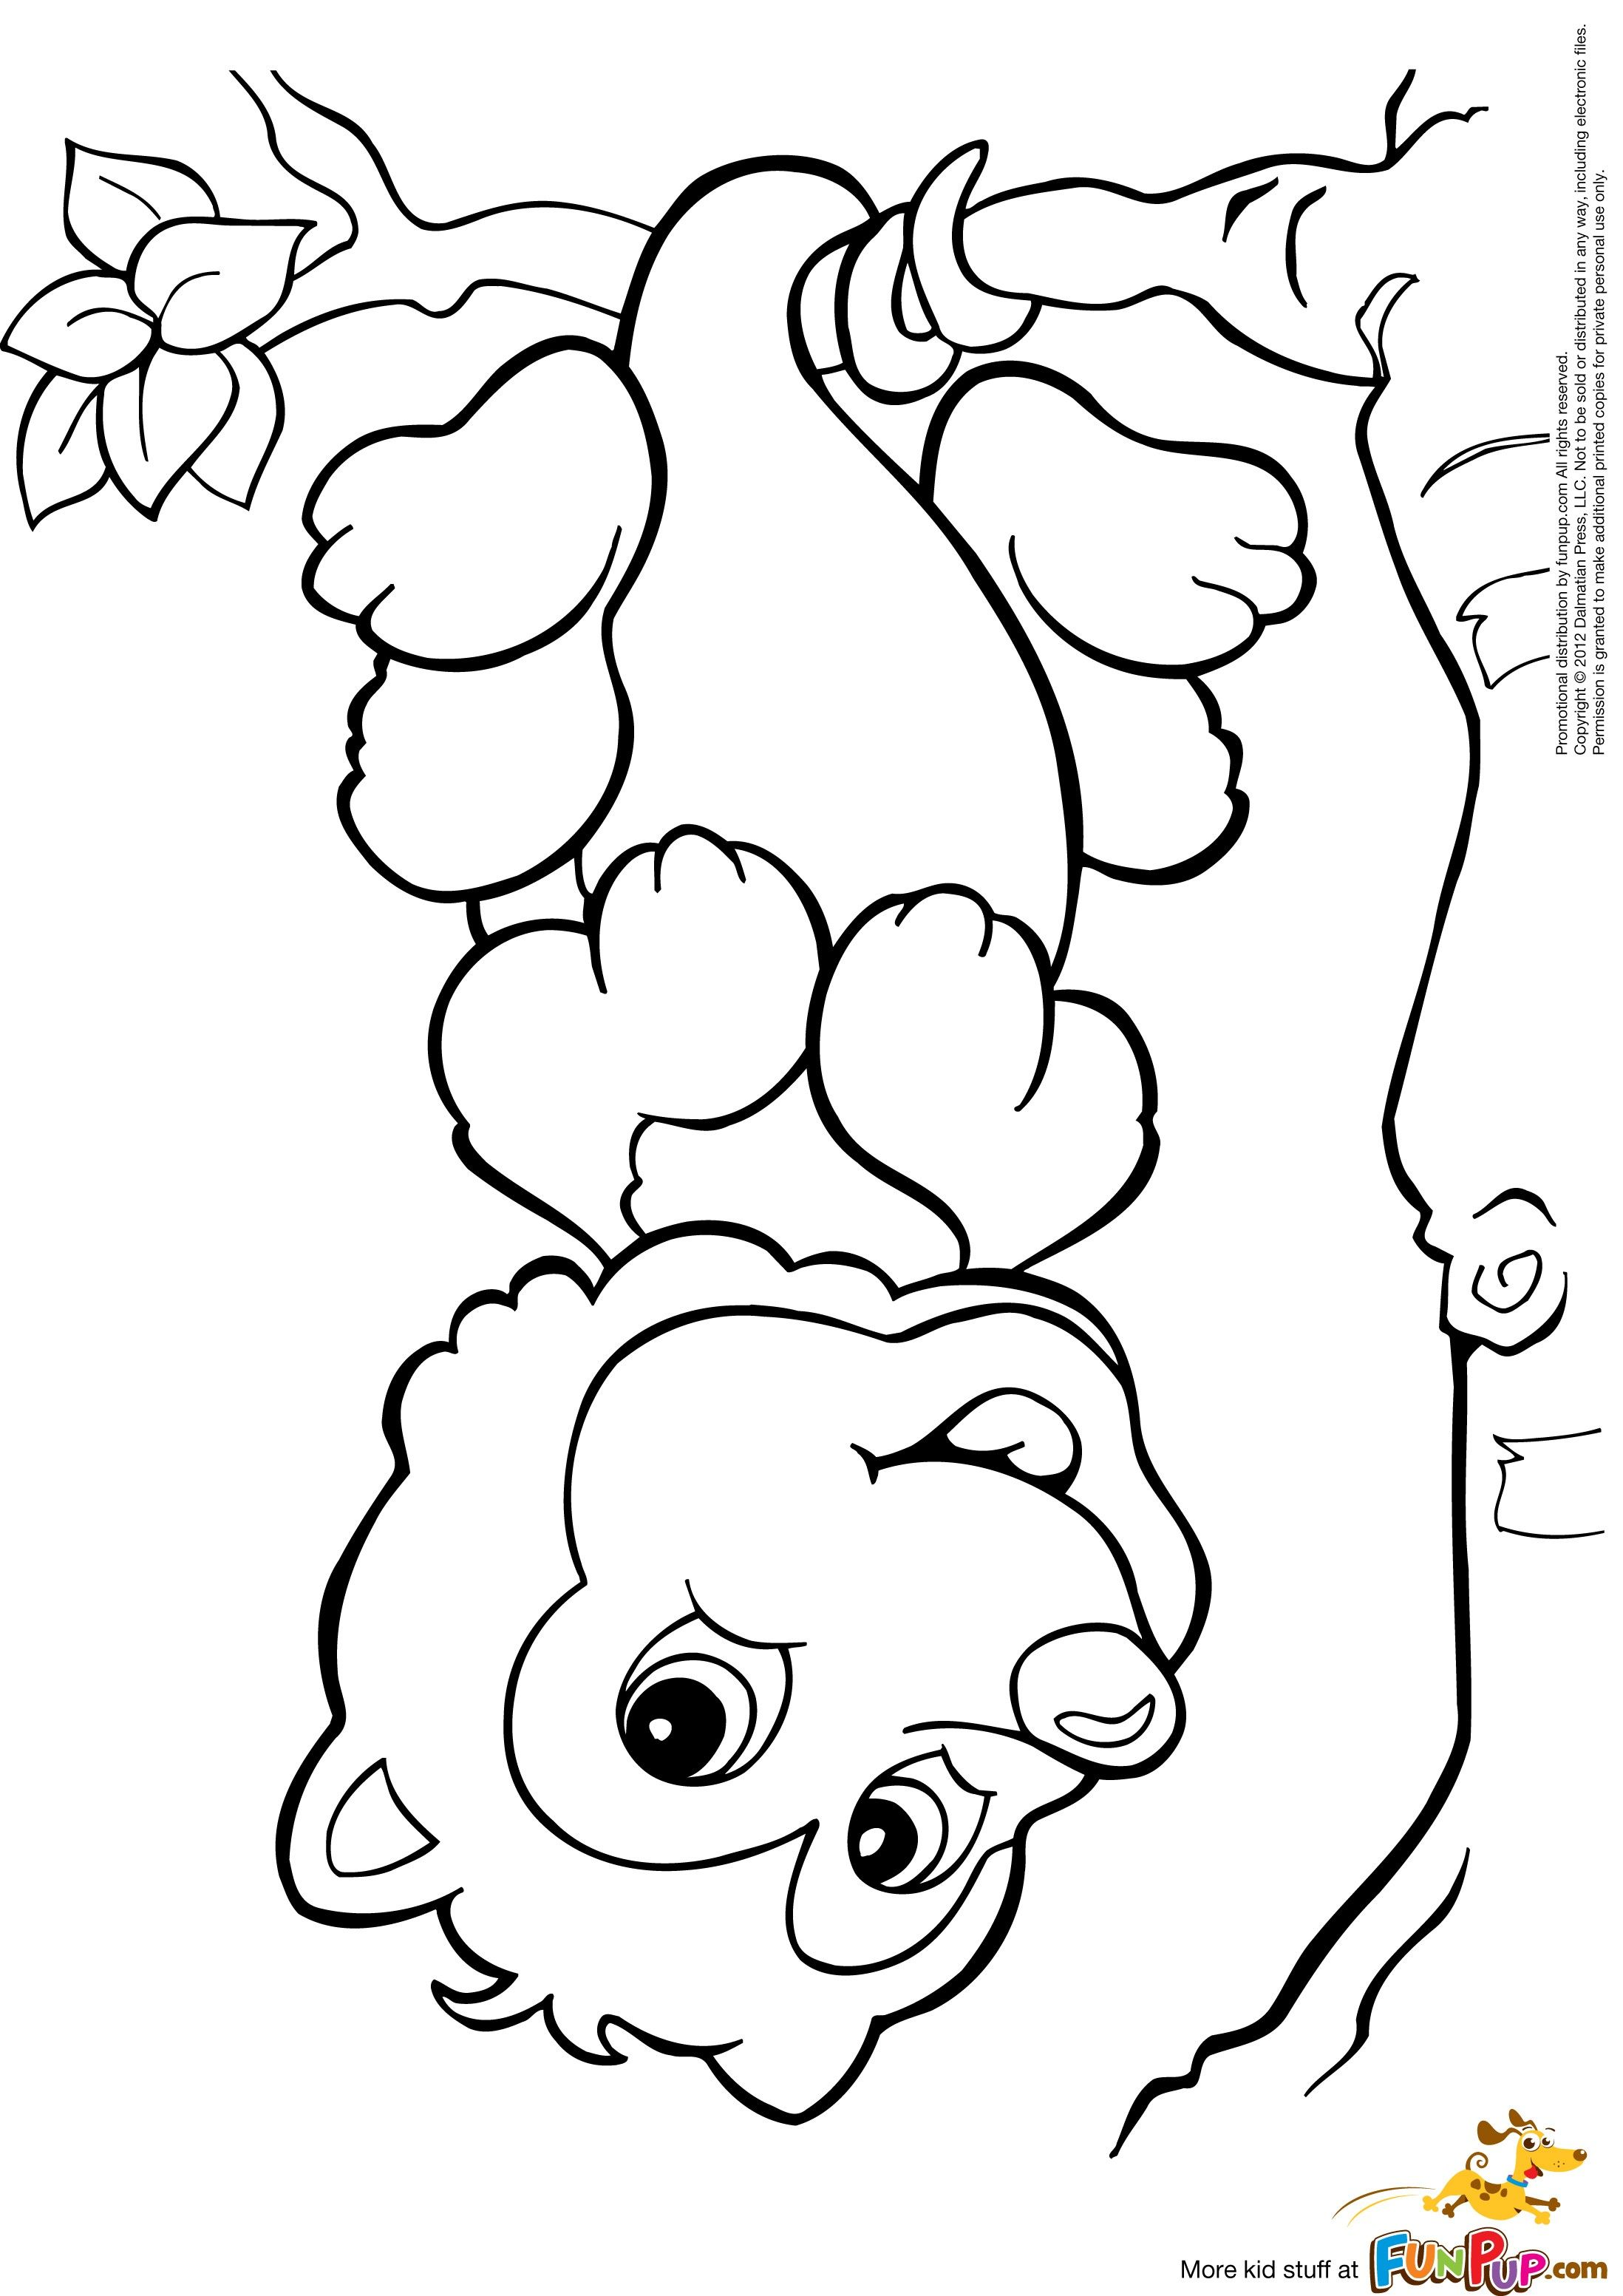 Possum Coloring Page